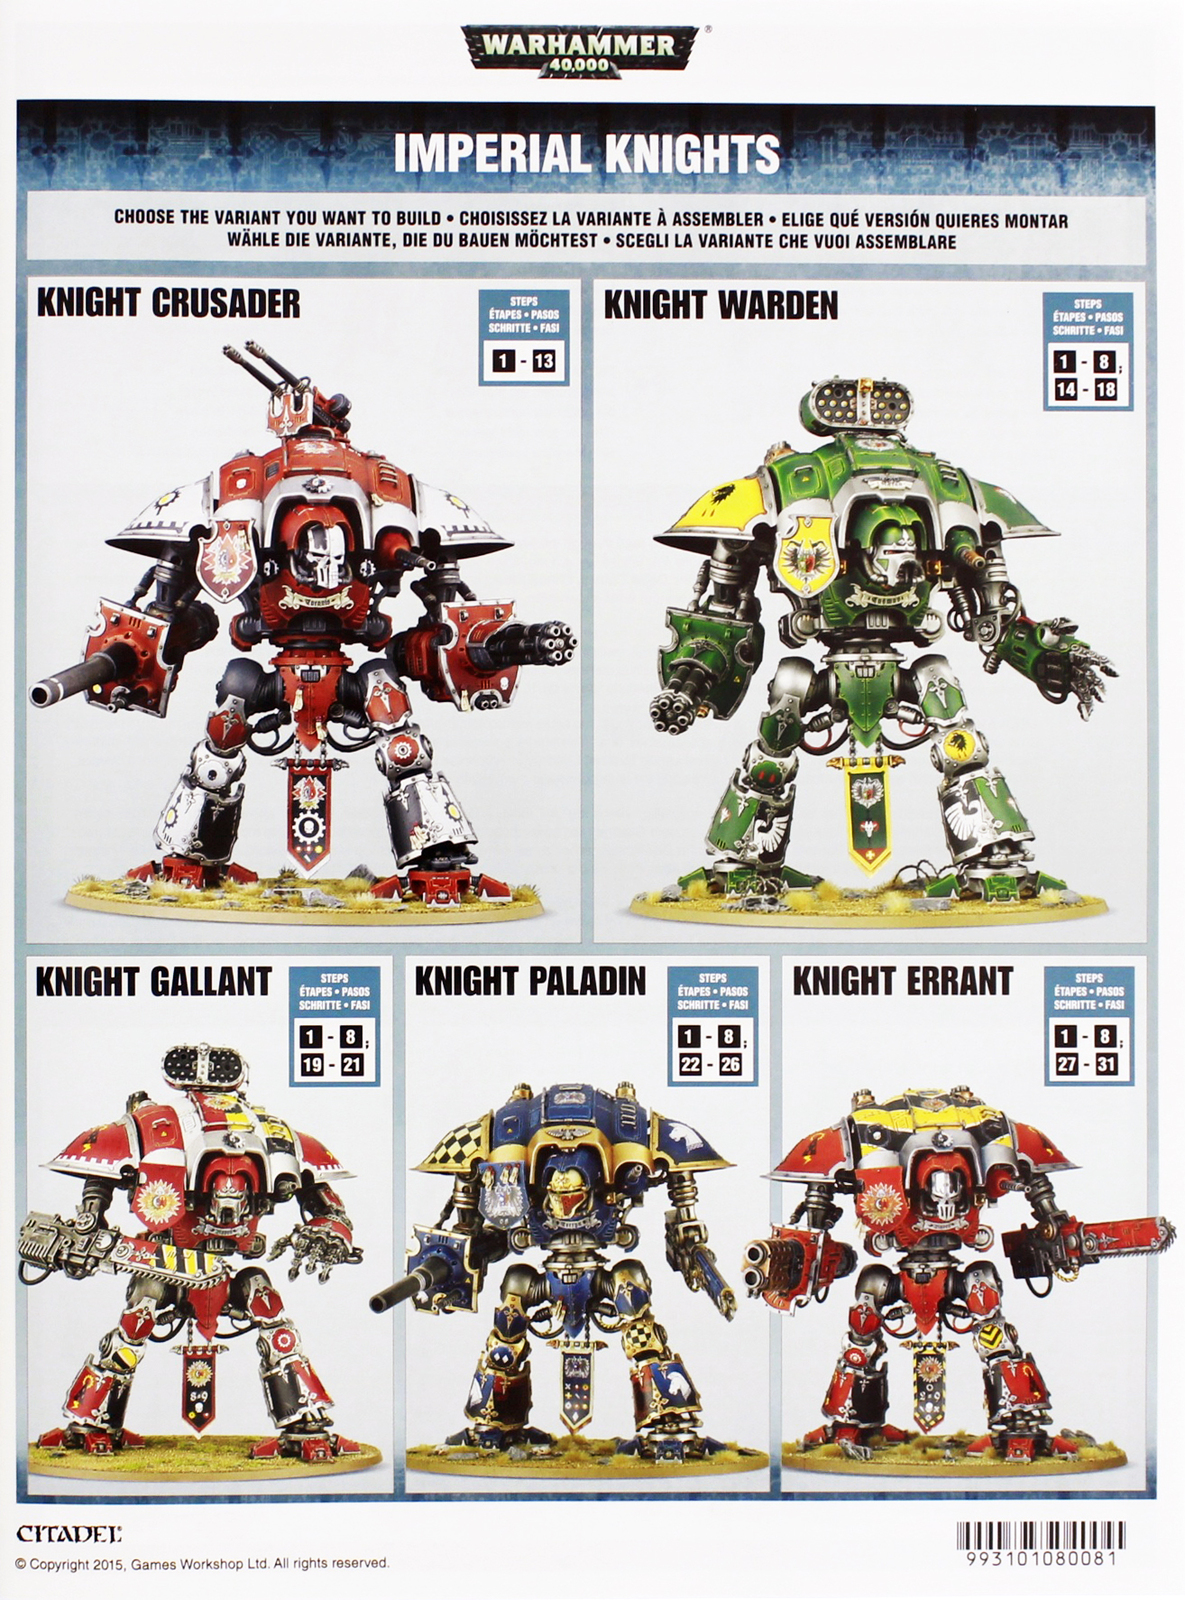 Warhammer 40,000 Imperial Knight Warden image